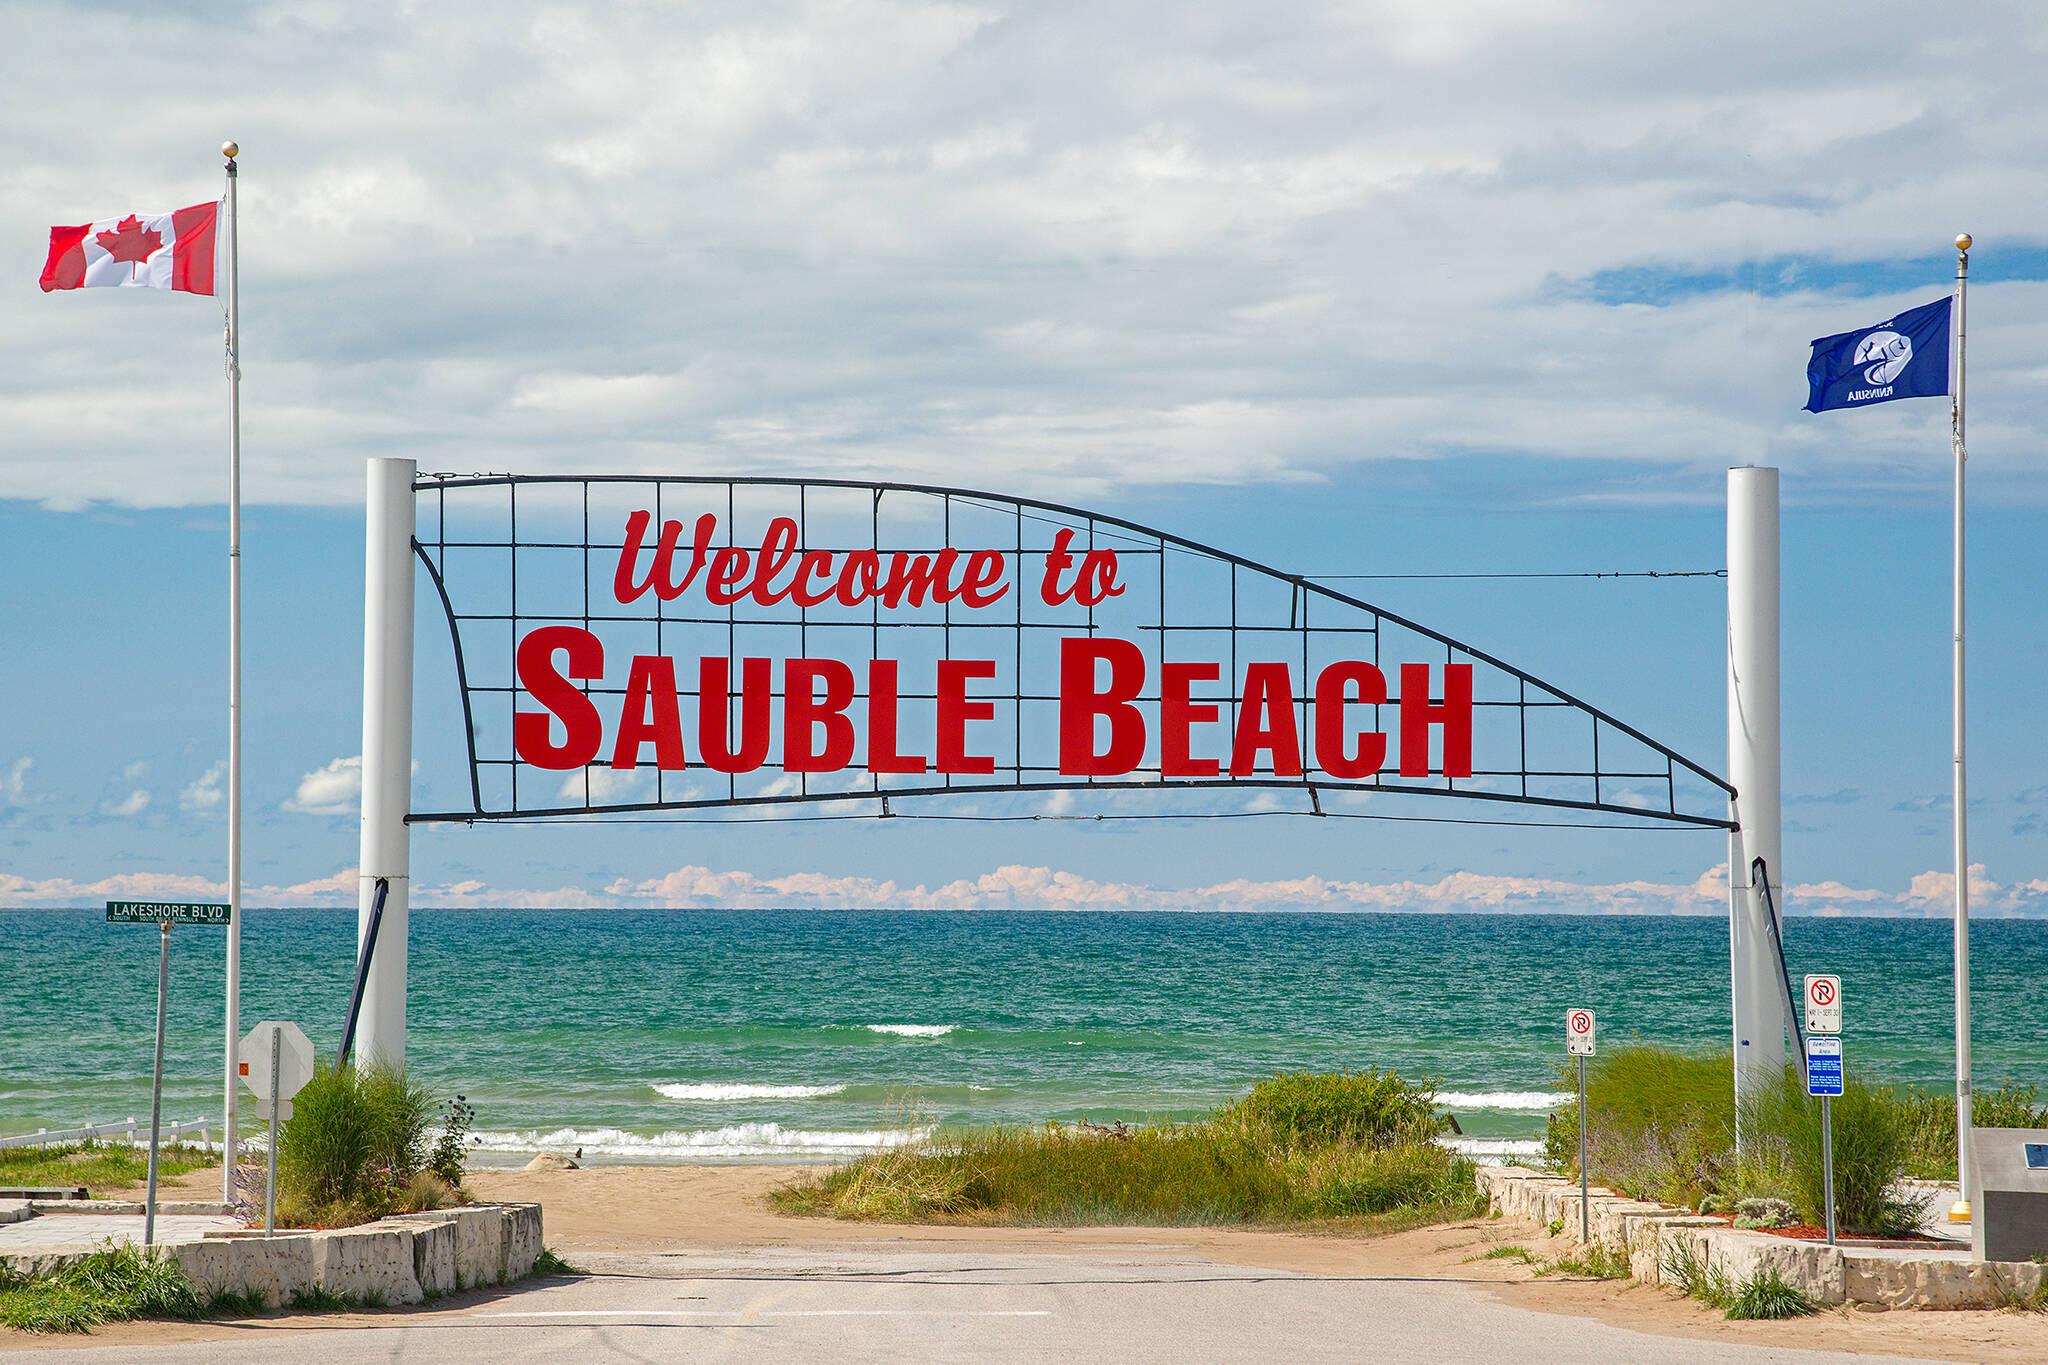 sauble beach closure